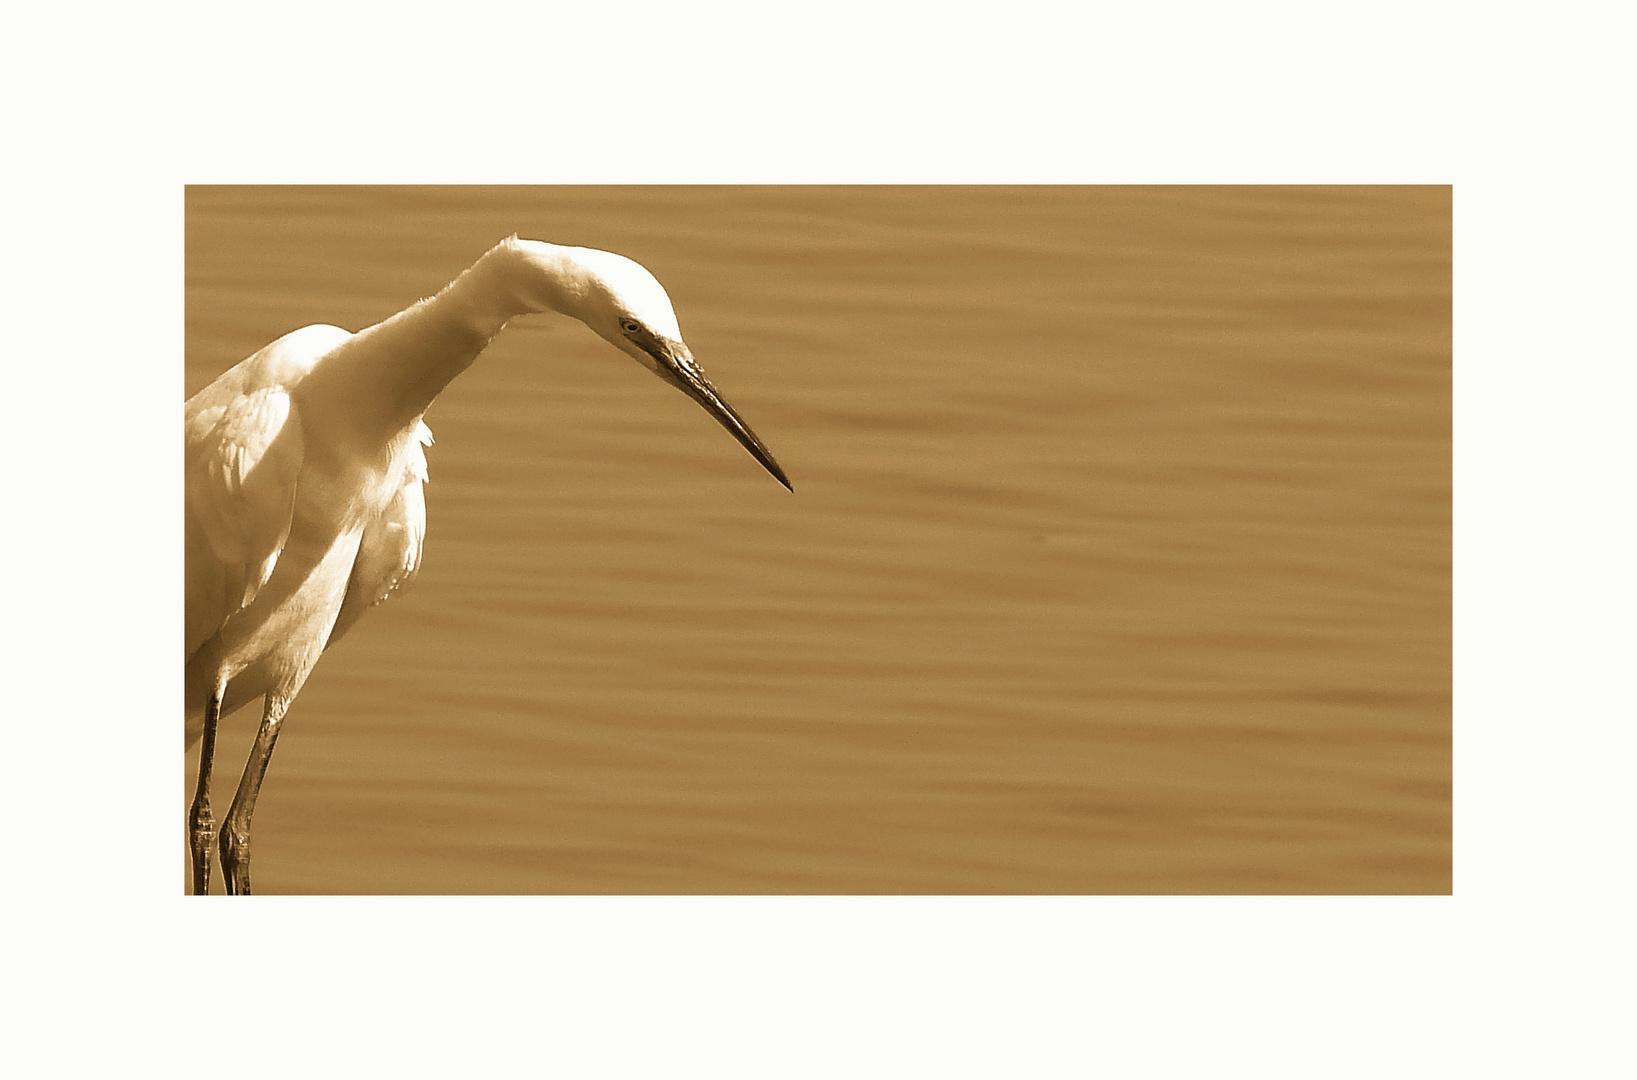 Le heron